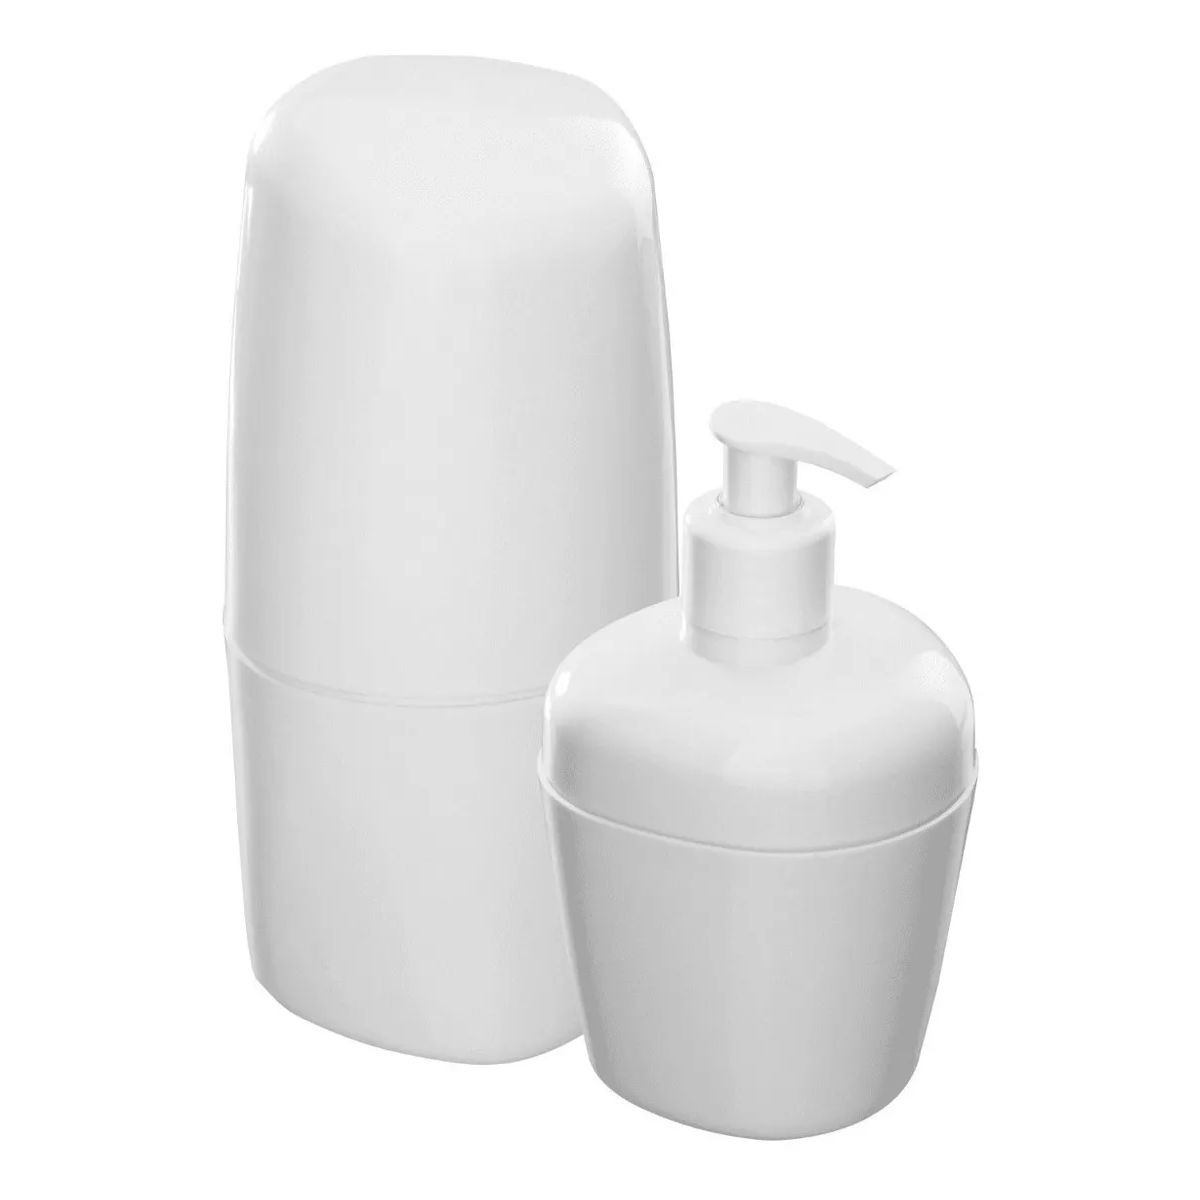 Kit Acessórios Organizador Para Banheiro Lavabo Astra 0198